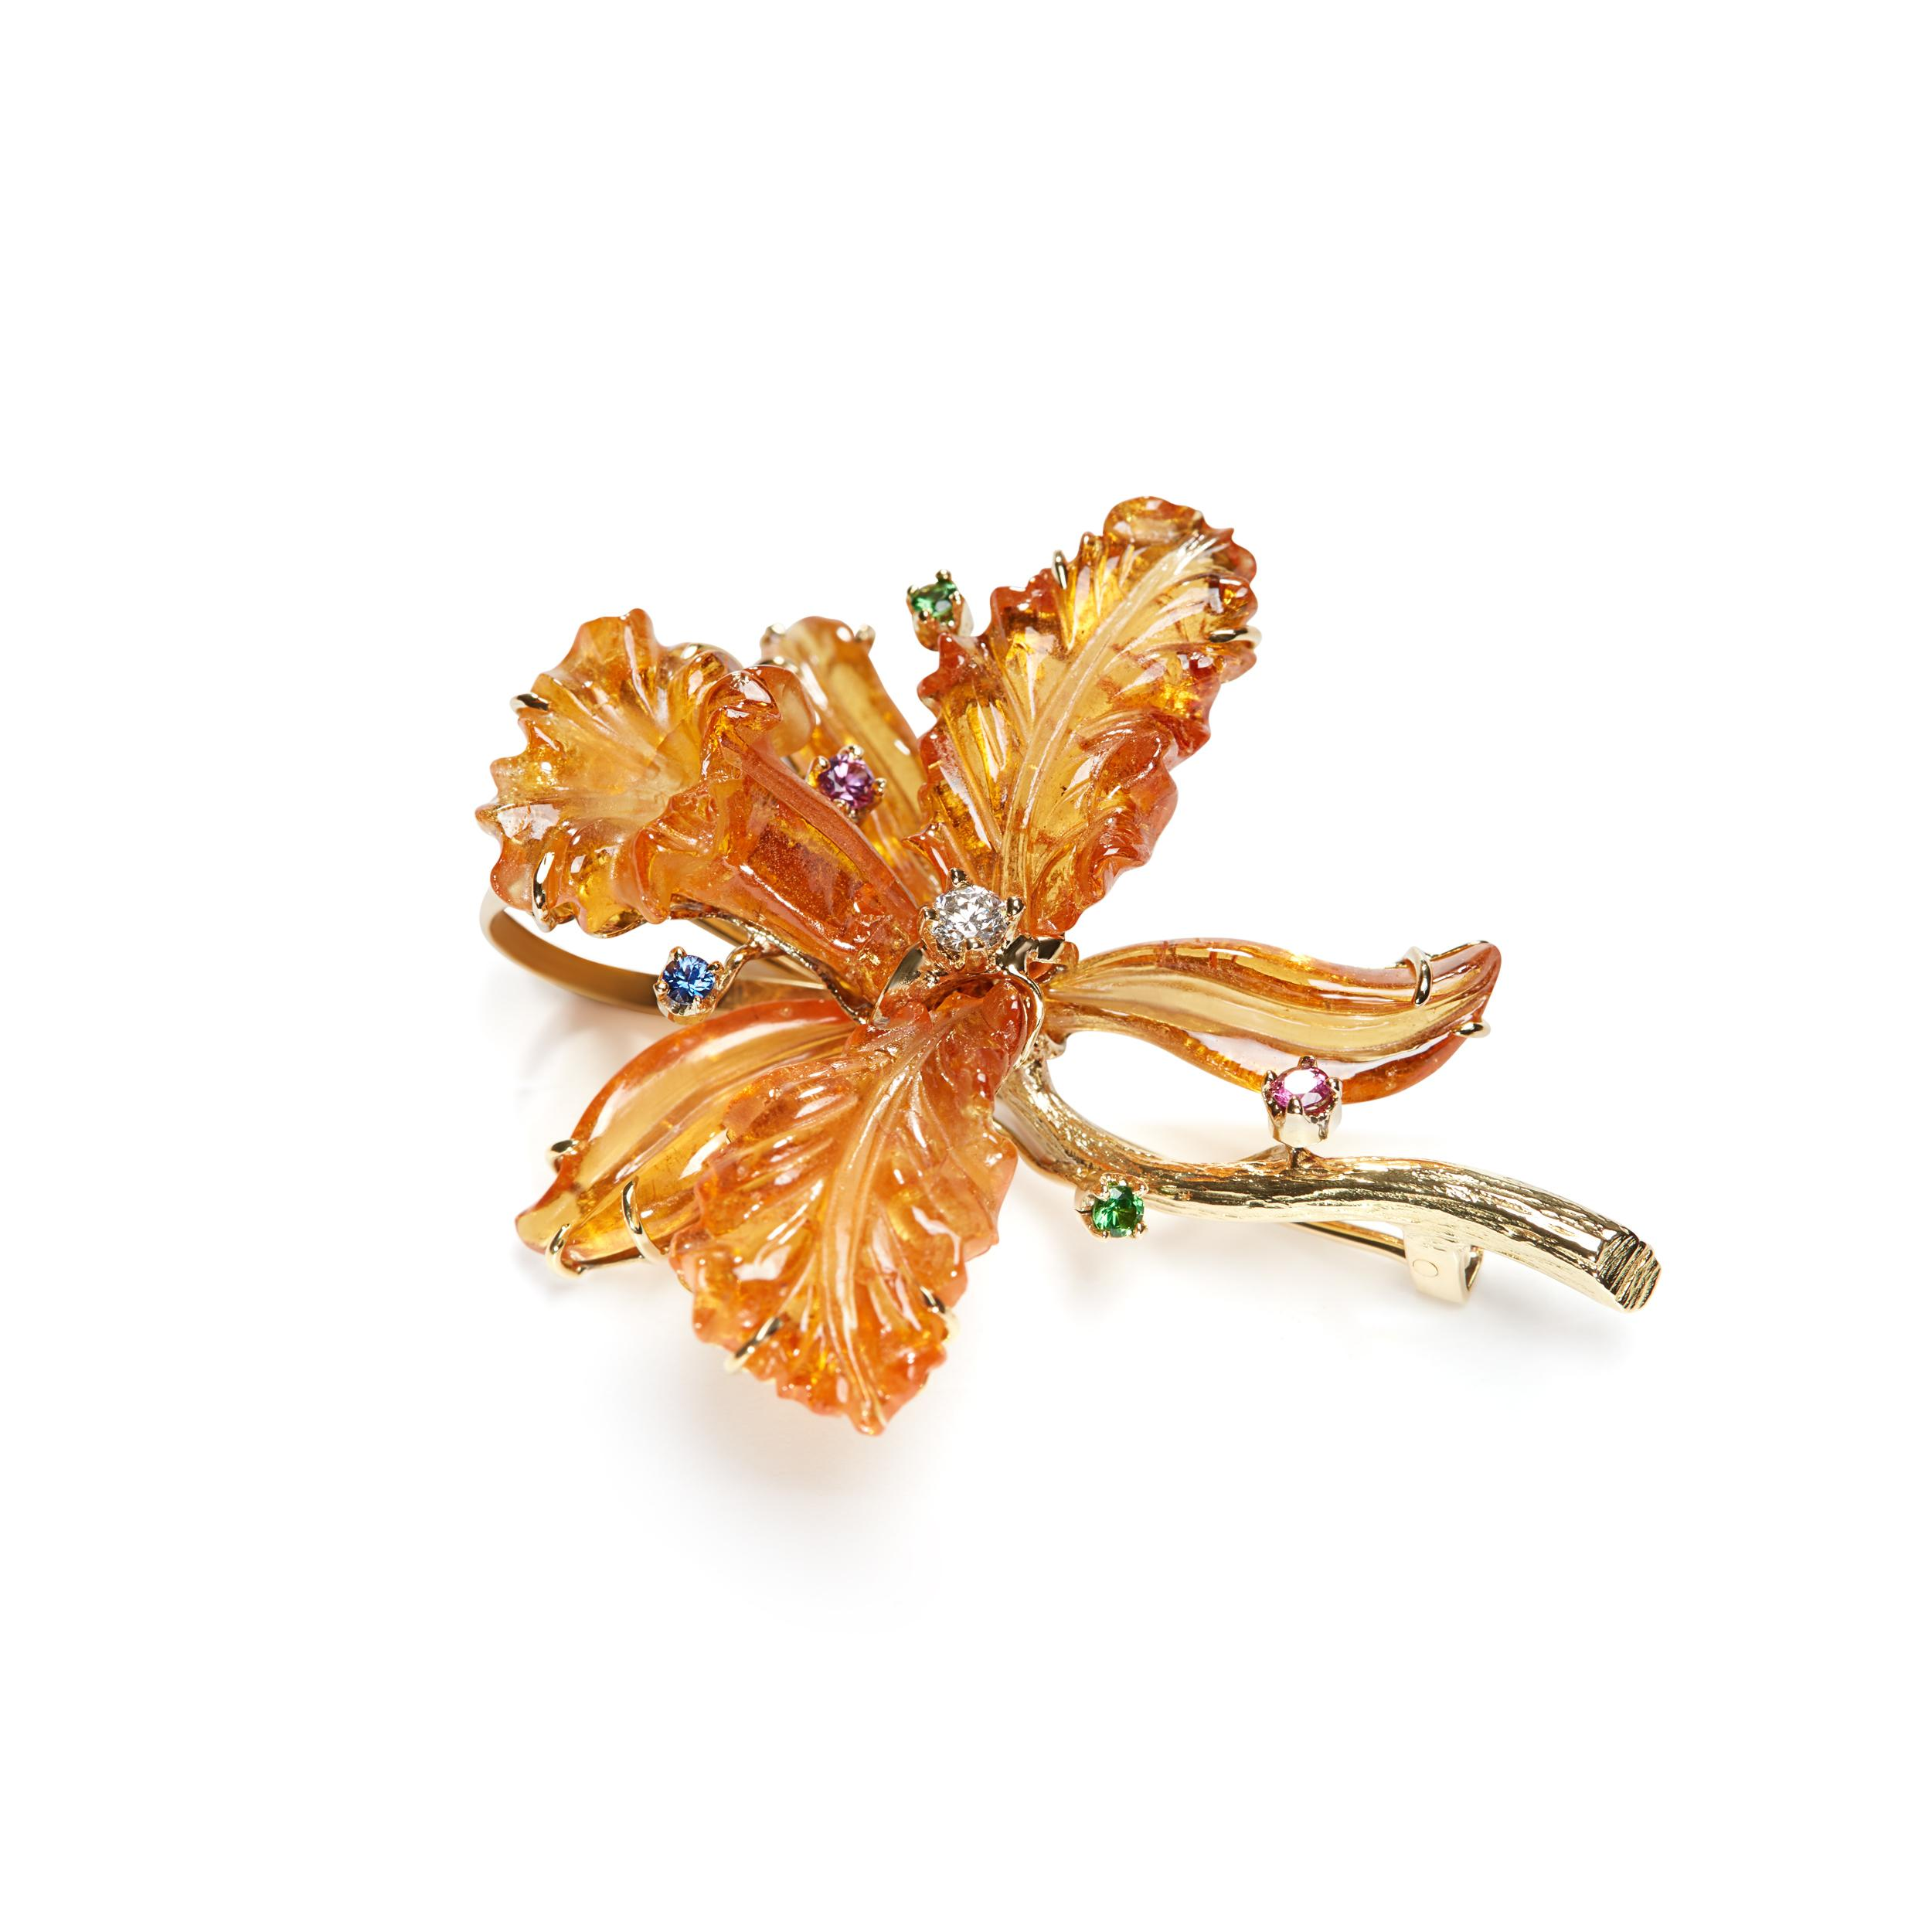 Flower-shaped gemstone Brooch